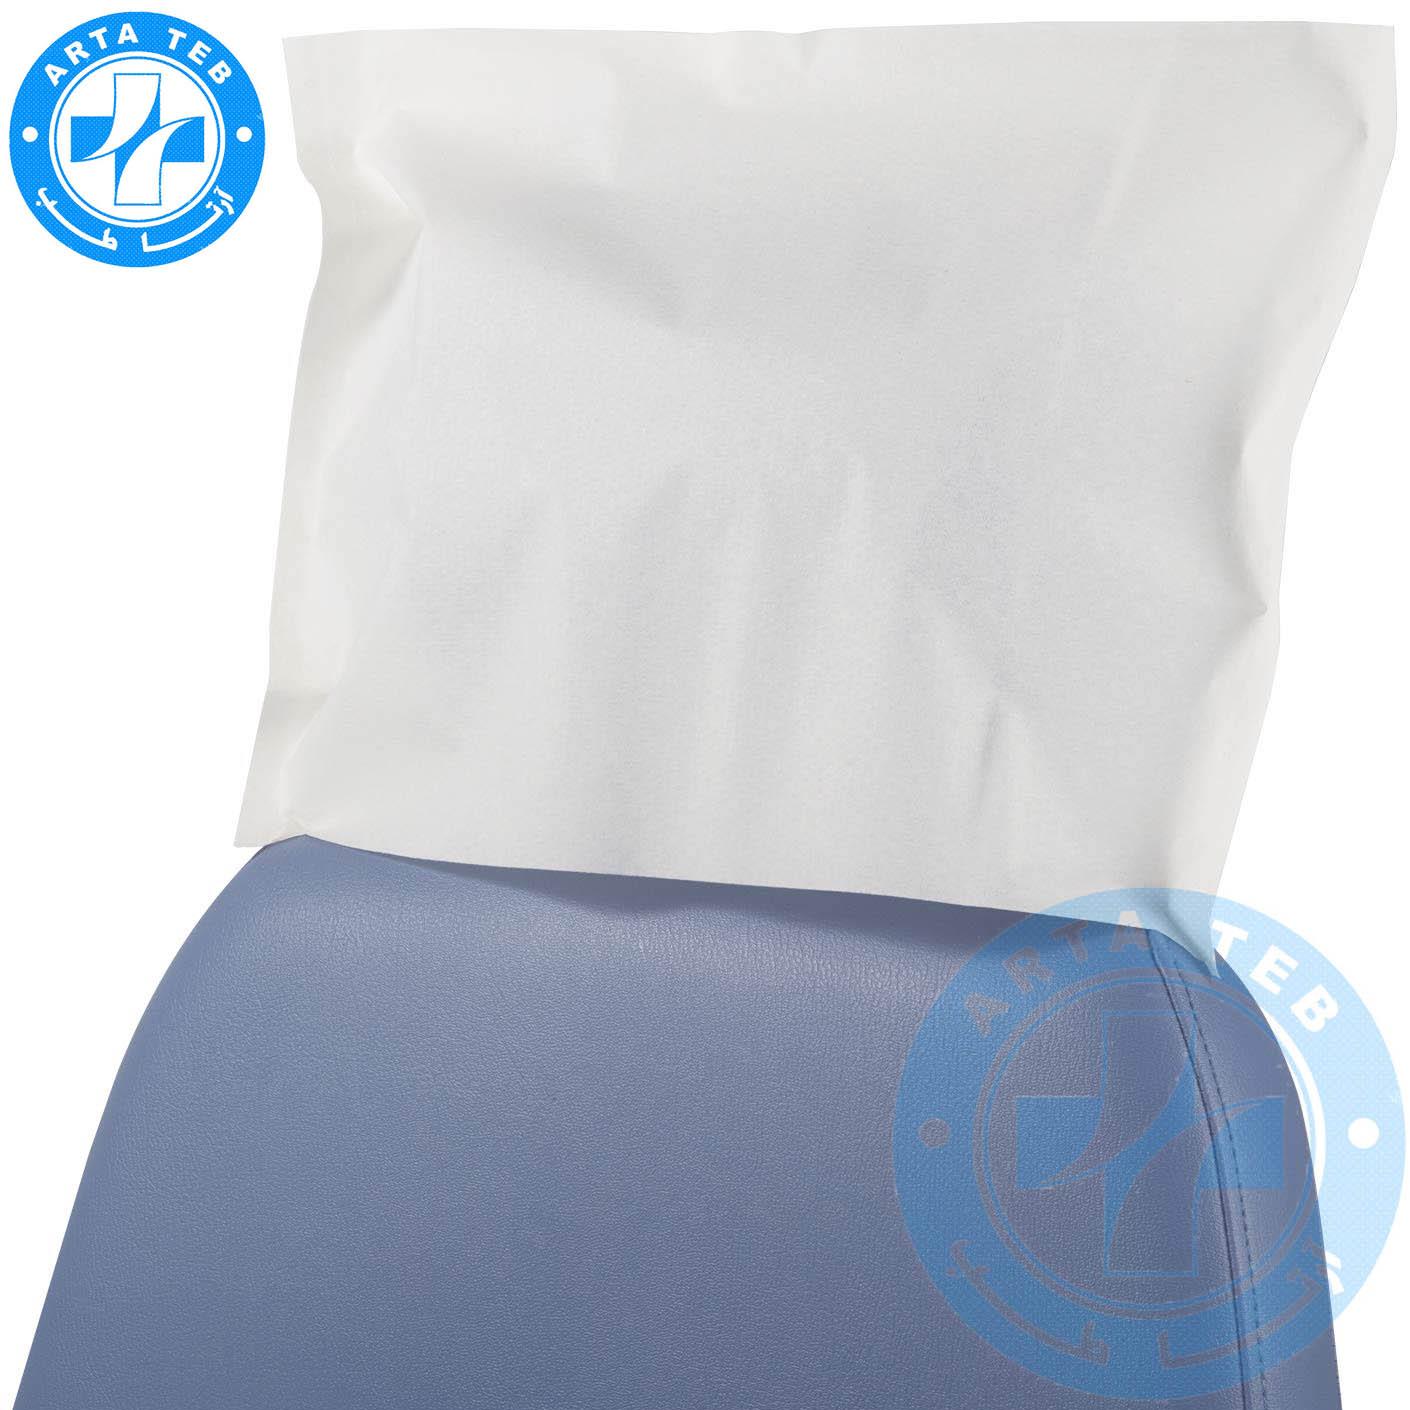 روکش زیر سری یونیت نایلونی یکبار مصرف دندانپزشکی (6)